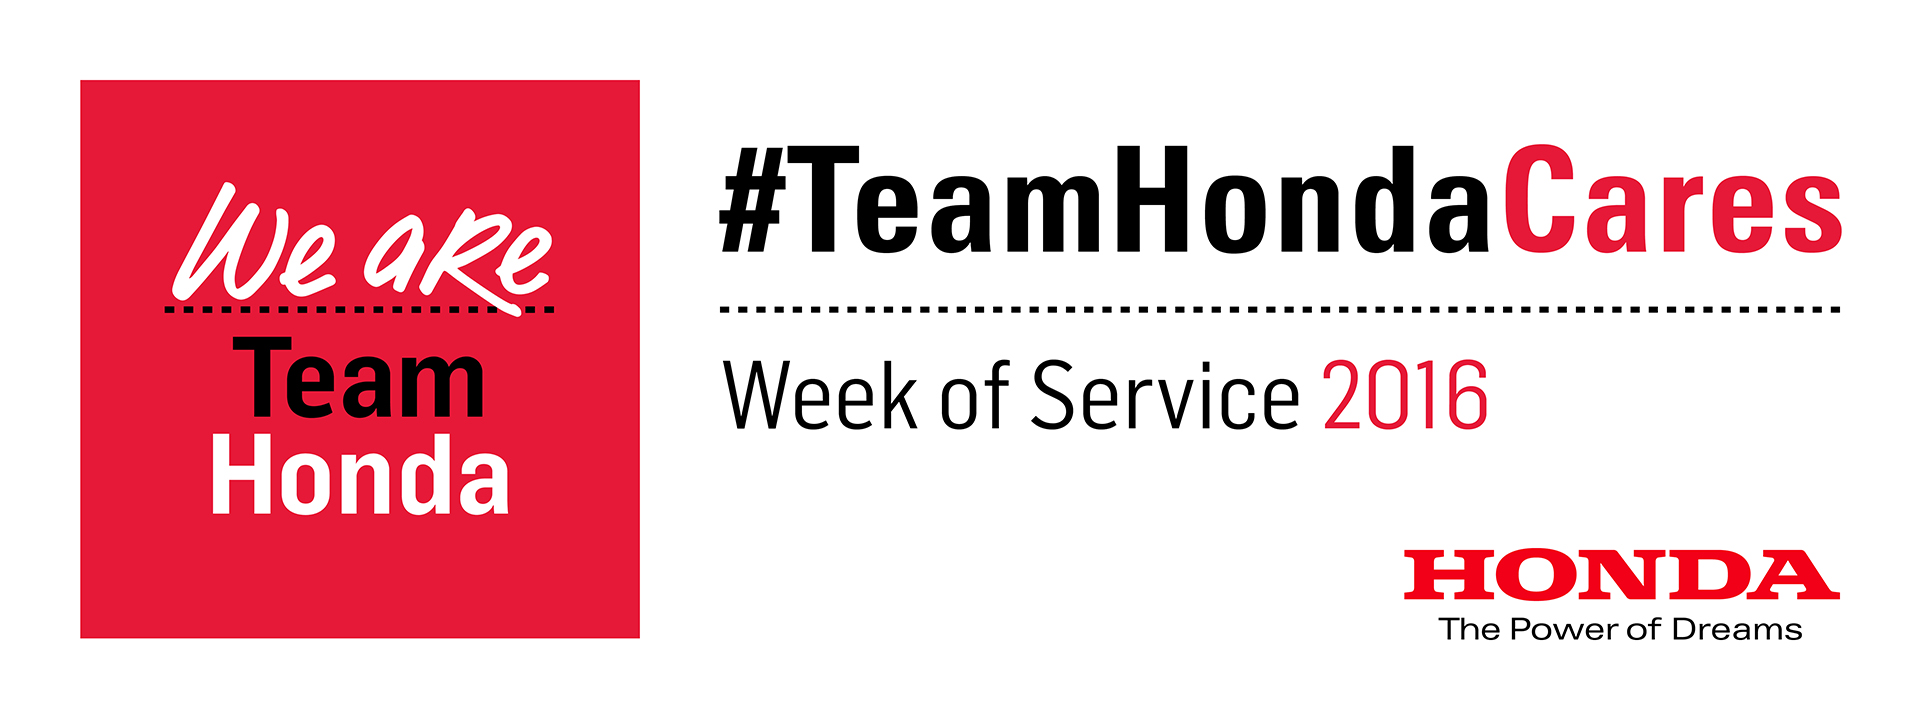 Honda North America >> Team Honda Kicks Off Week Of Service In North America Honda In America